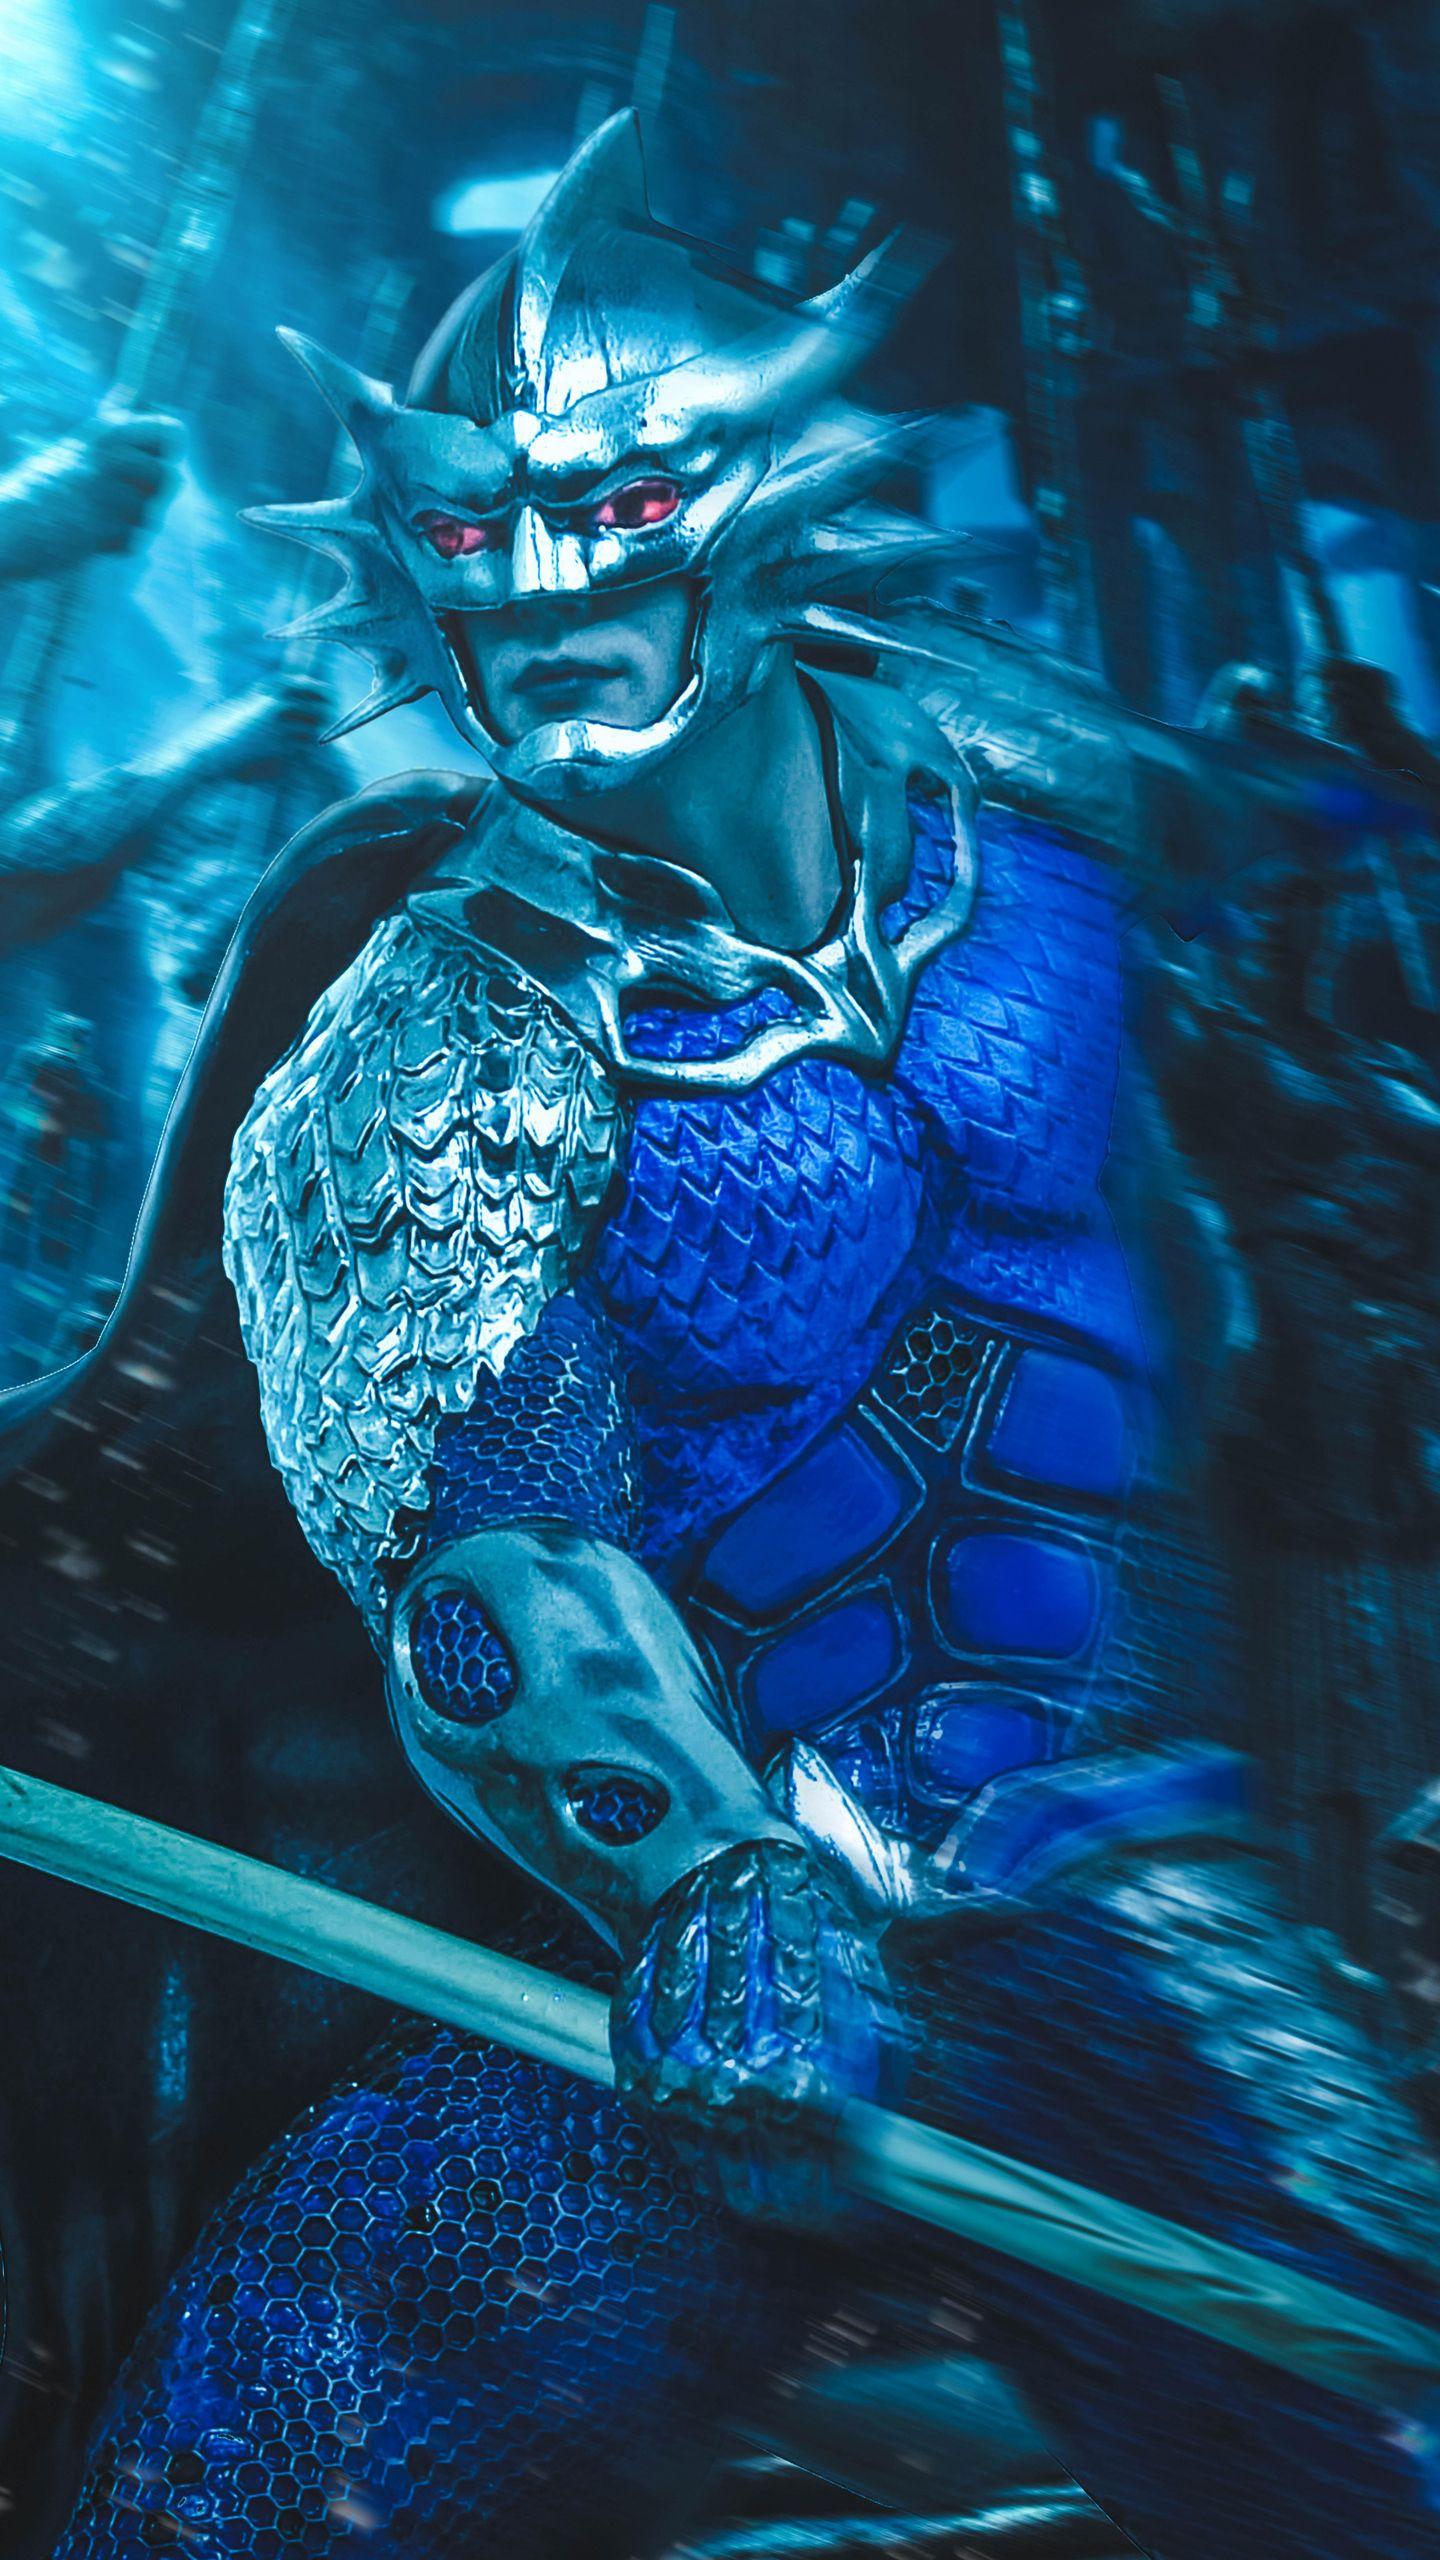 Pin by Andre Bundle on Aquaman Superhero background